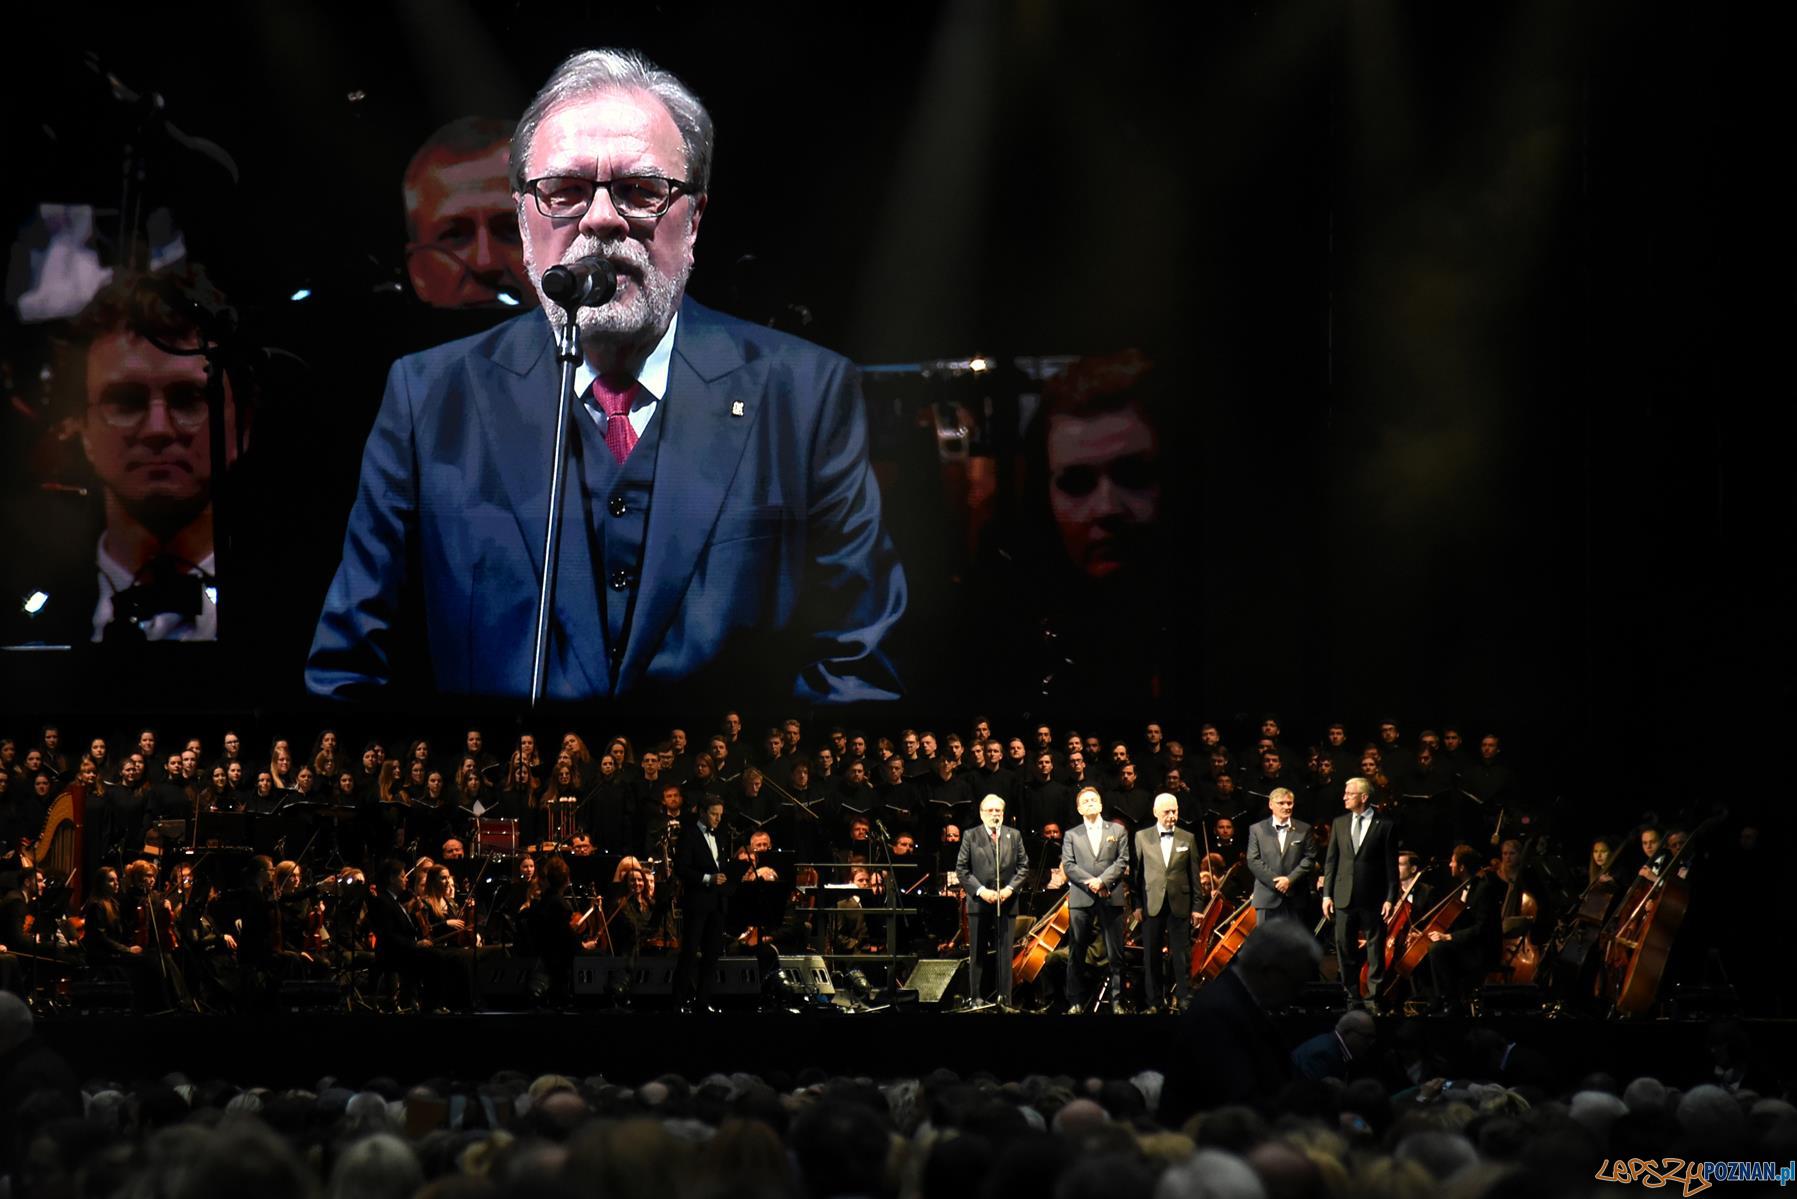 Andrea Bocelli - koncert w Poznaniu - prof. Andrzej Lesicki, rektor UAM  Foto: UMP